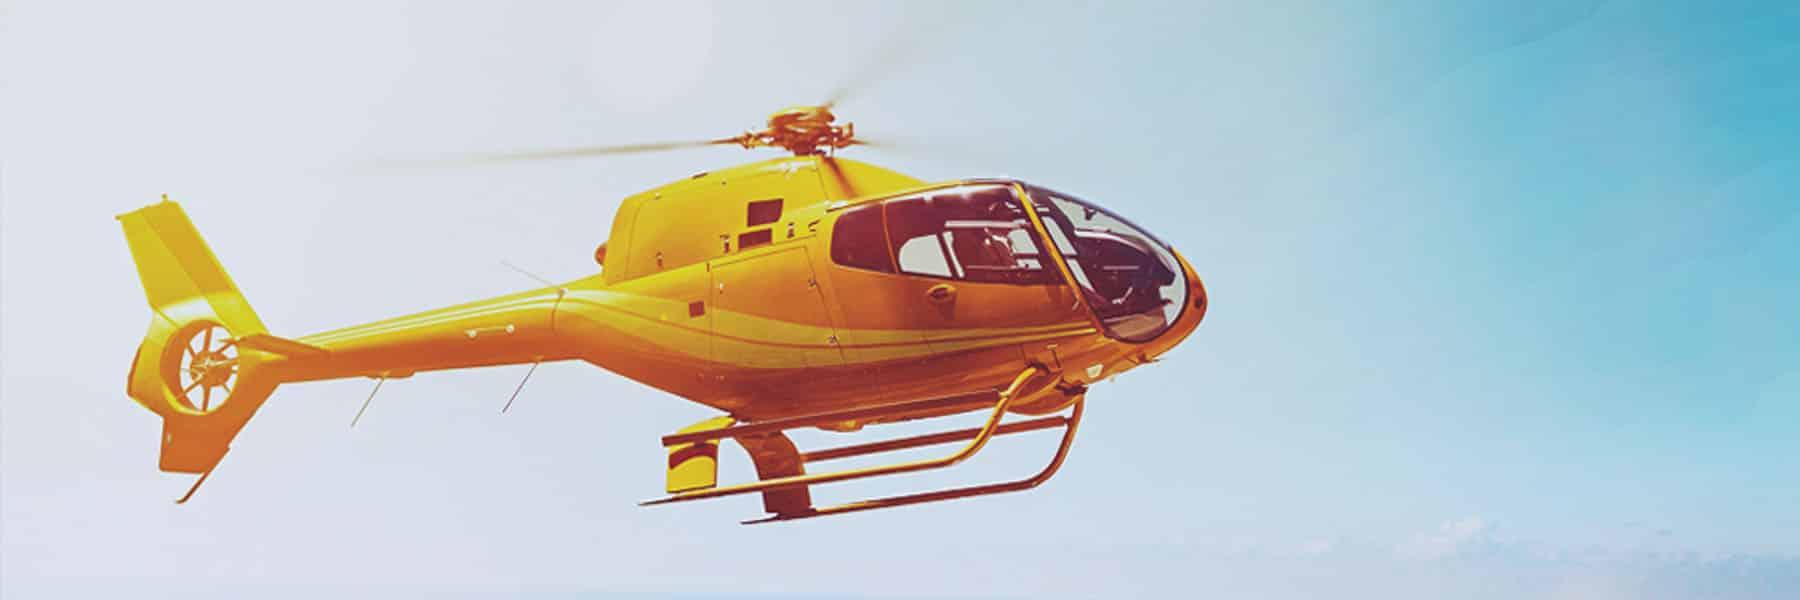 Helicoptero tour nyc